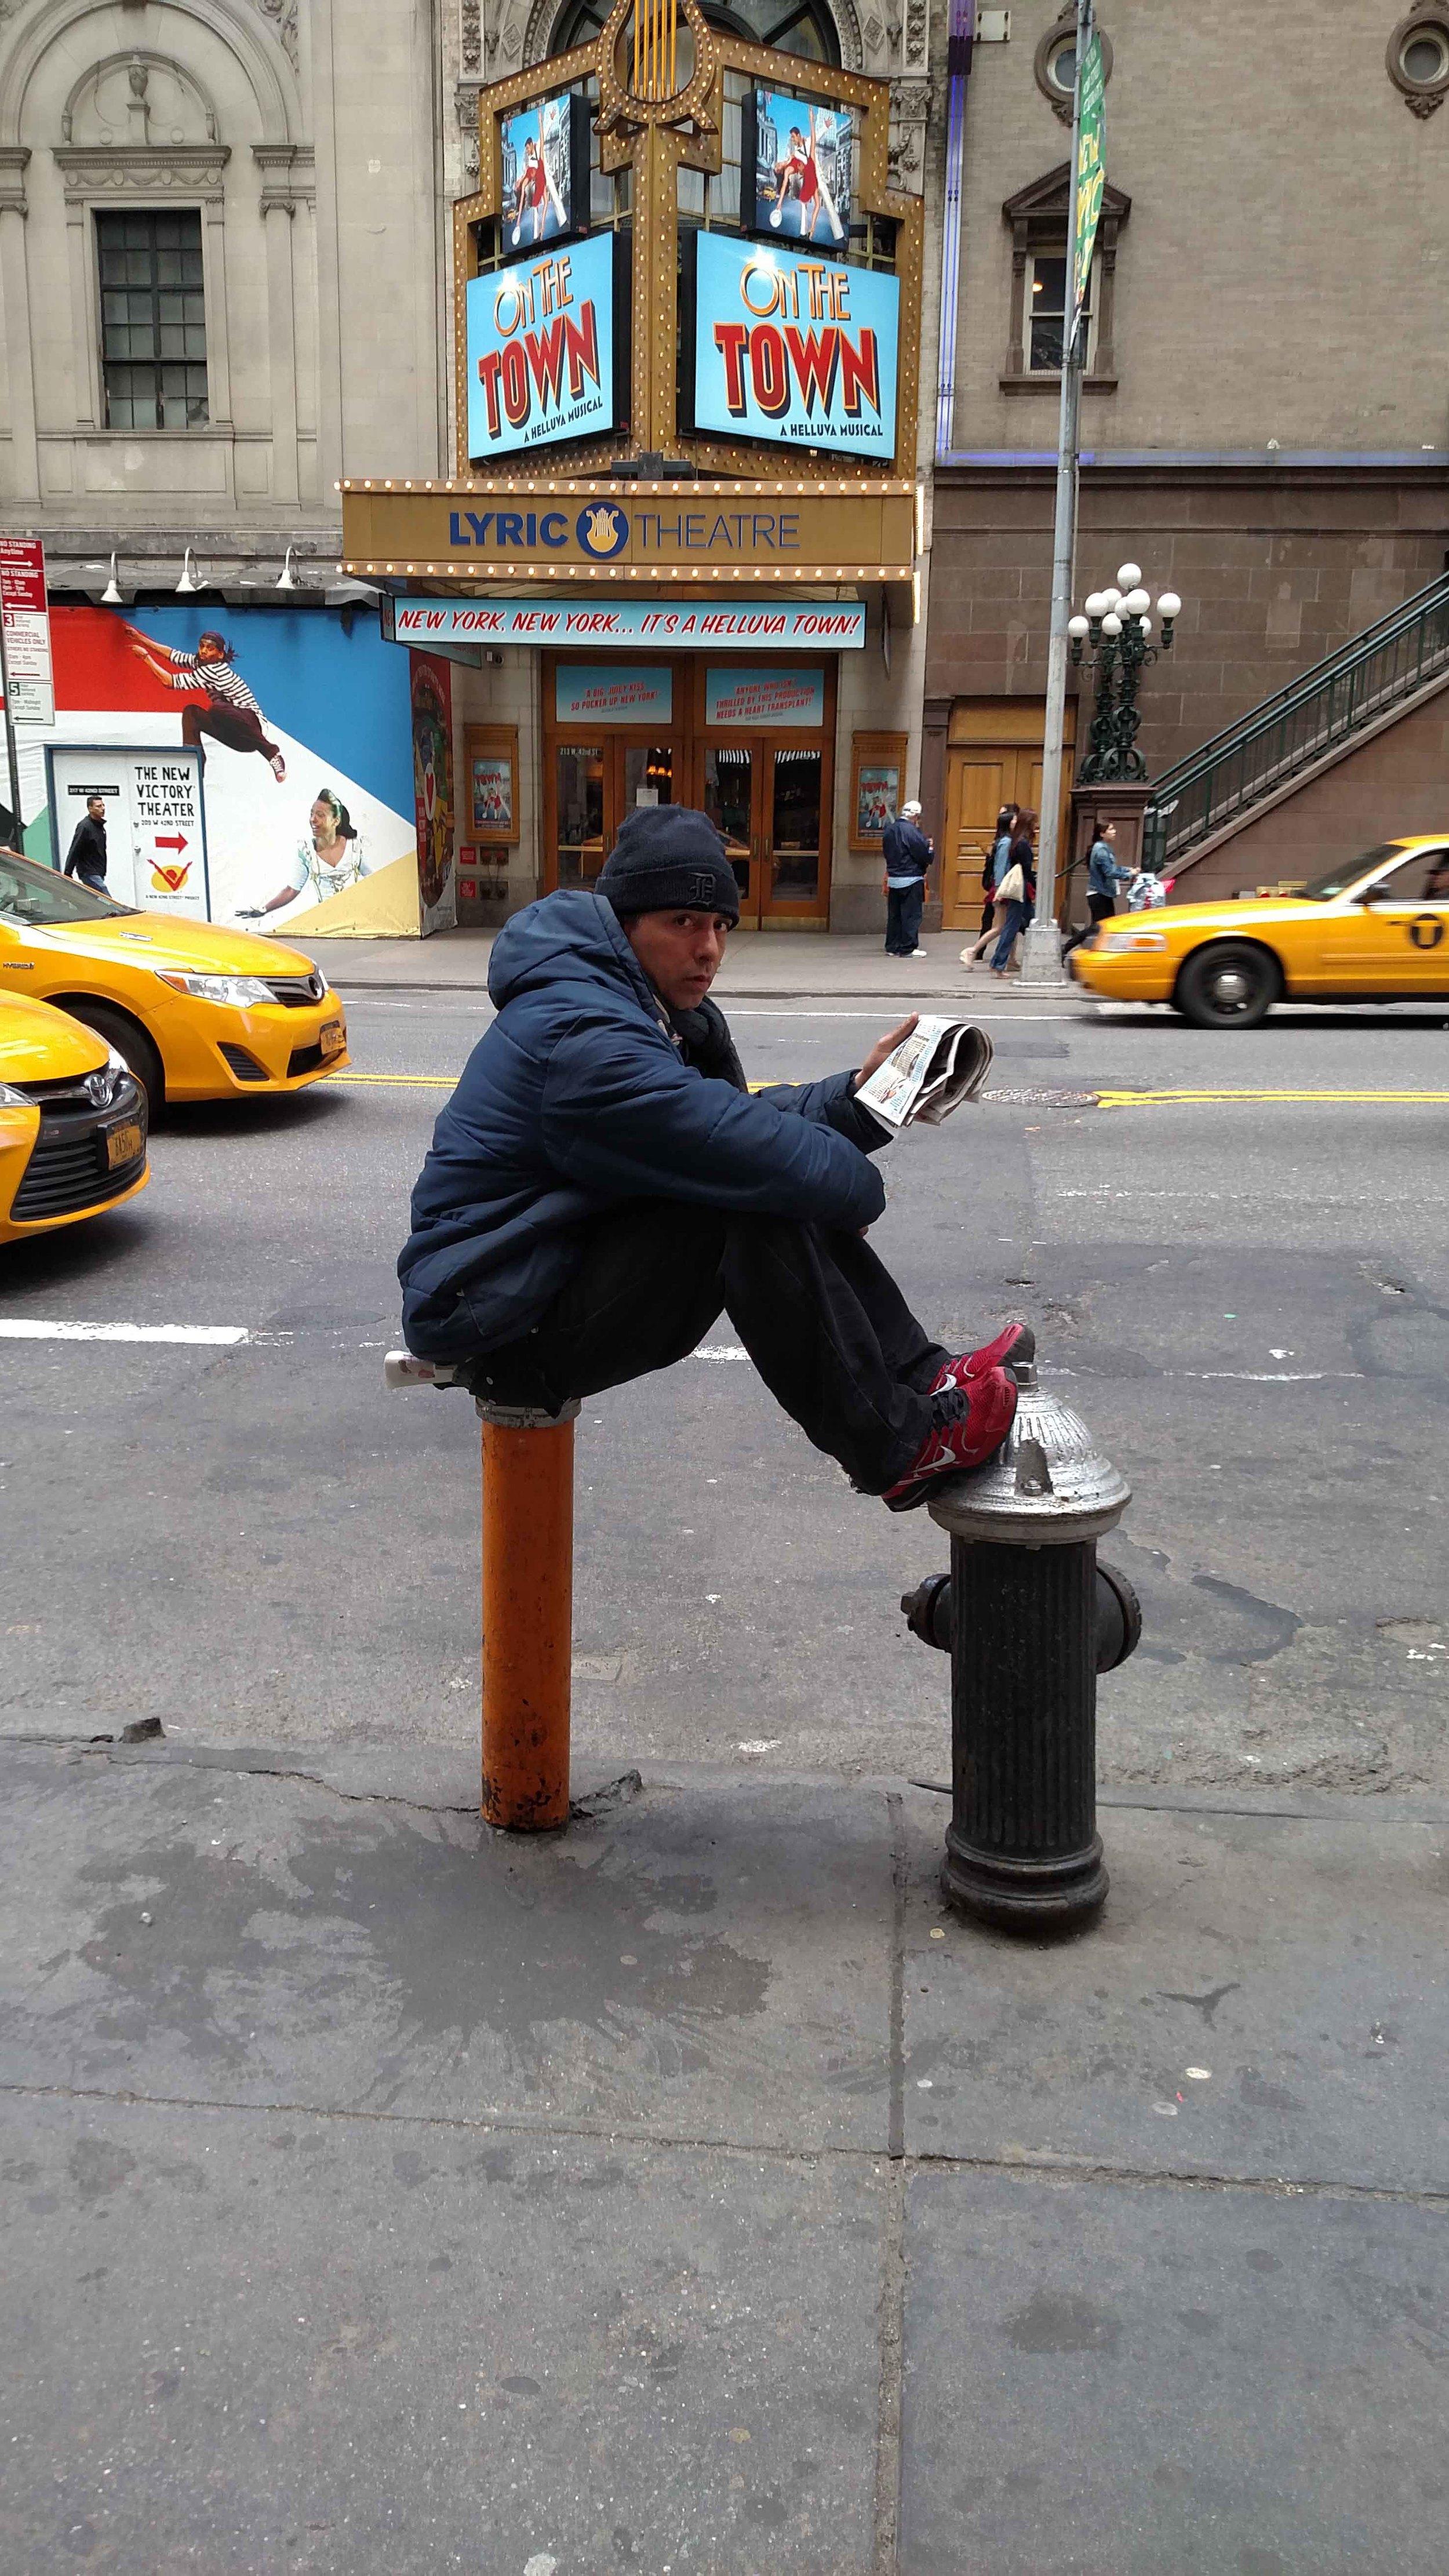 Streetphotography 3.0-146.jpg